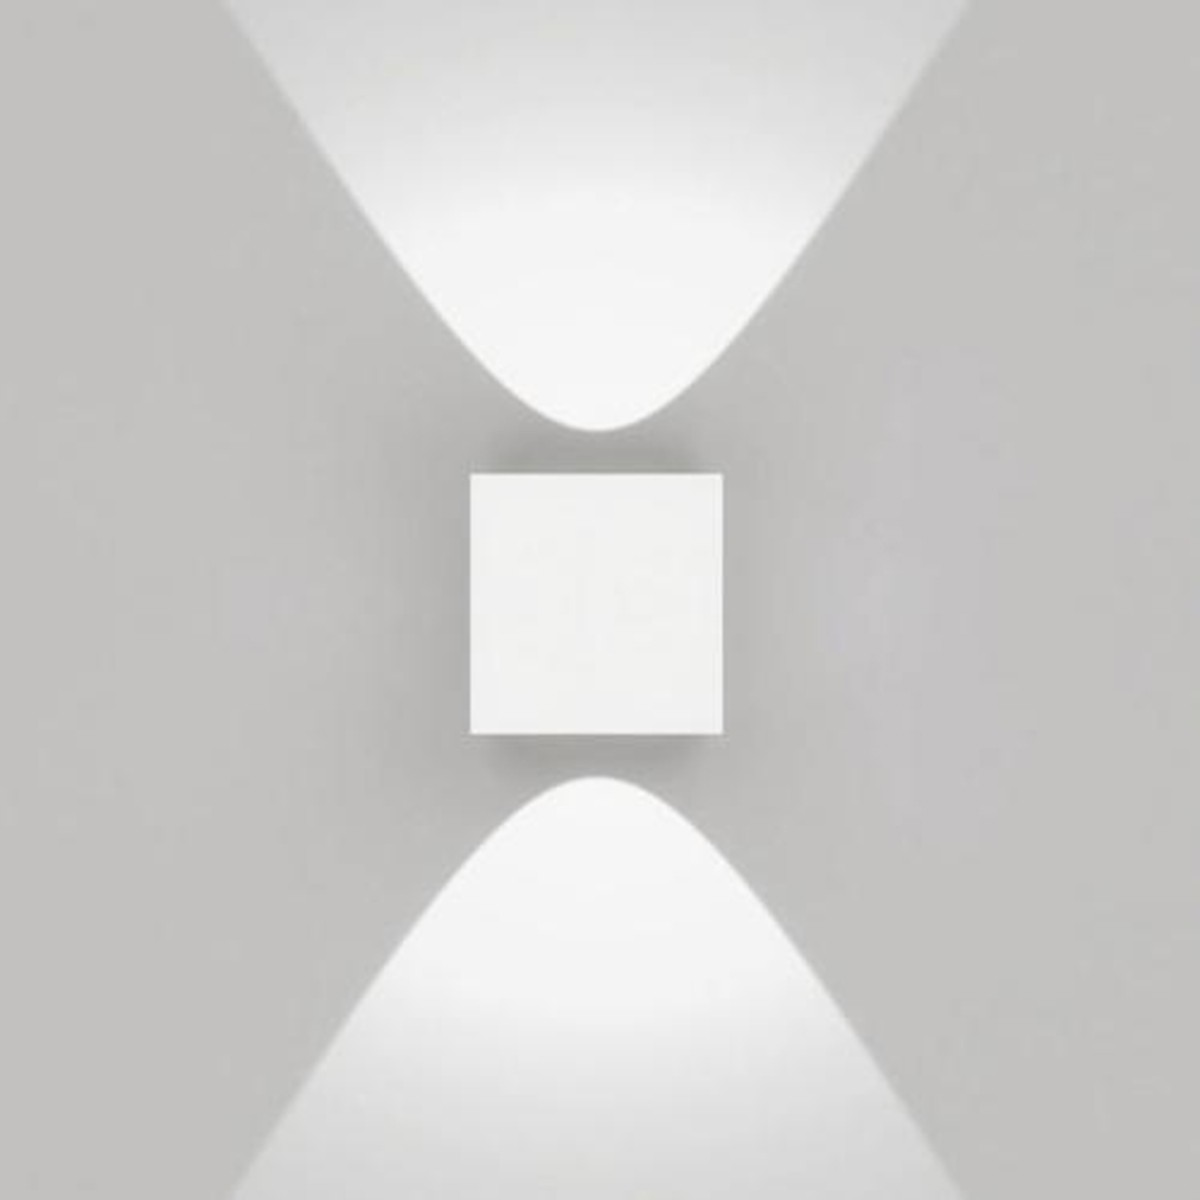 Artemide Outdoor Effetto 14S LED 2L Wandleuchte, 2 x 50°, 3000 K, hellgrau